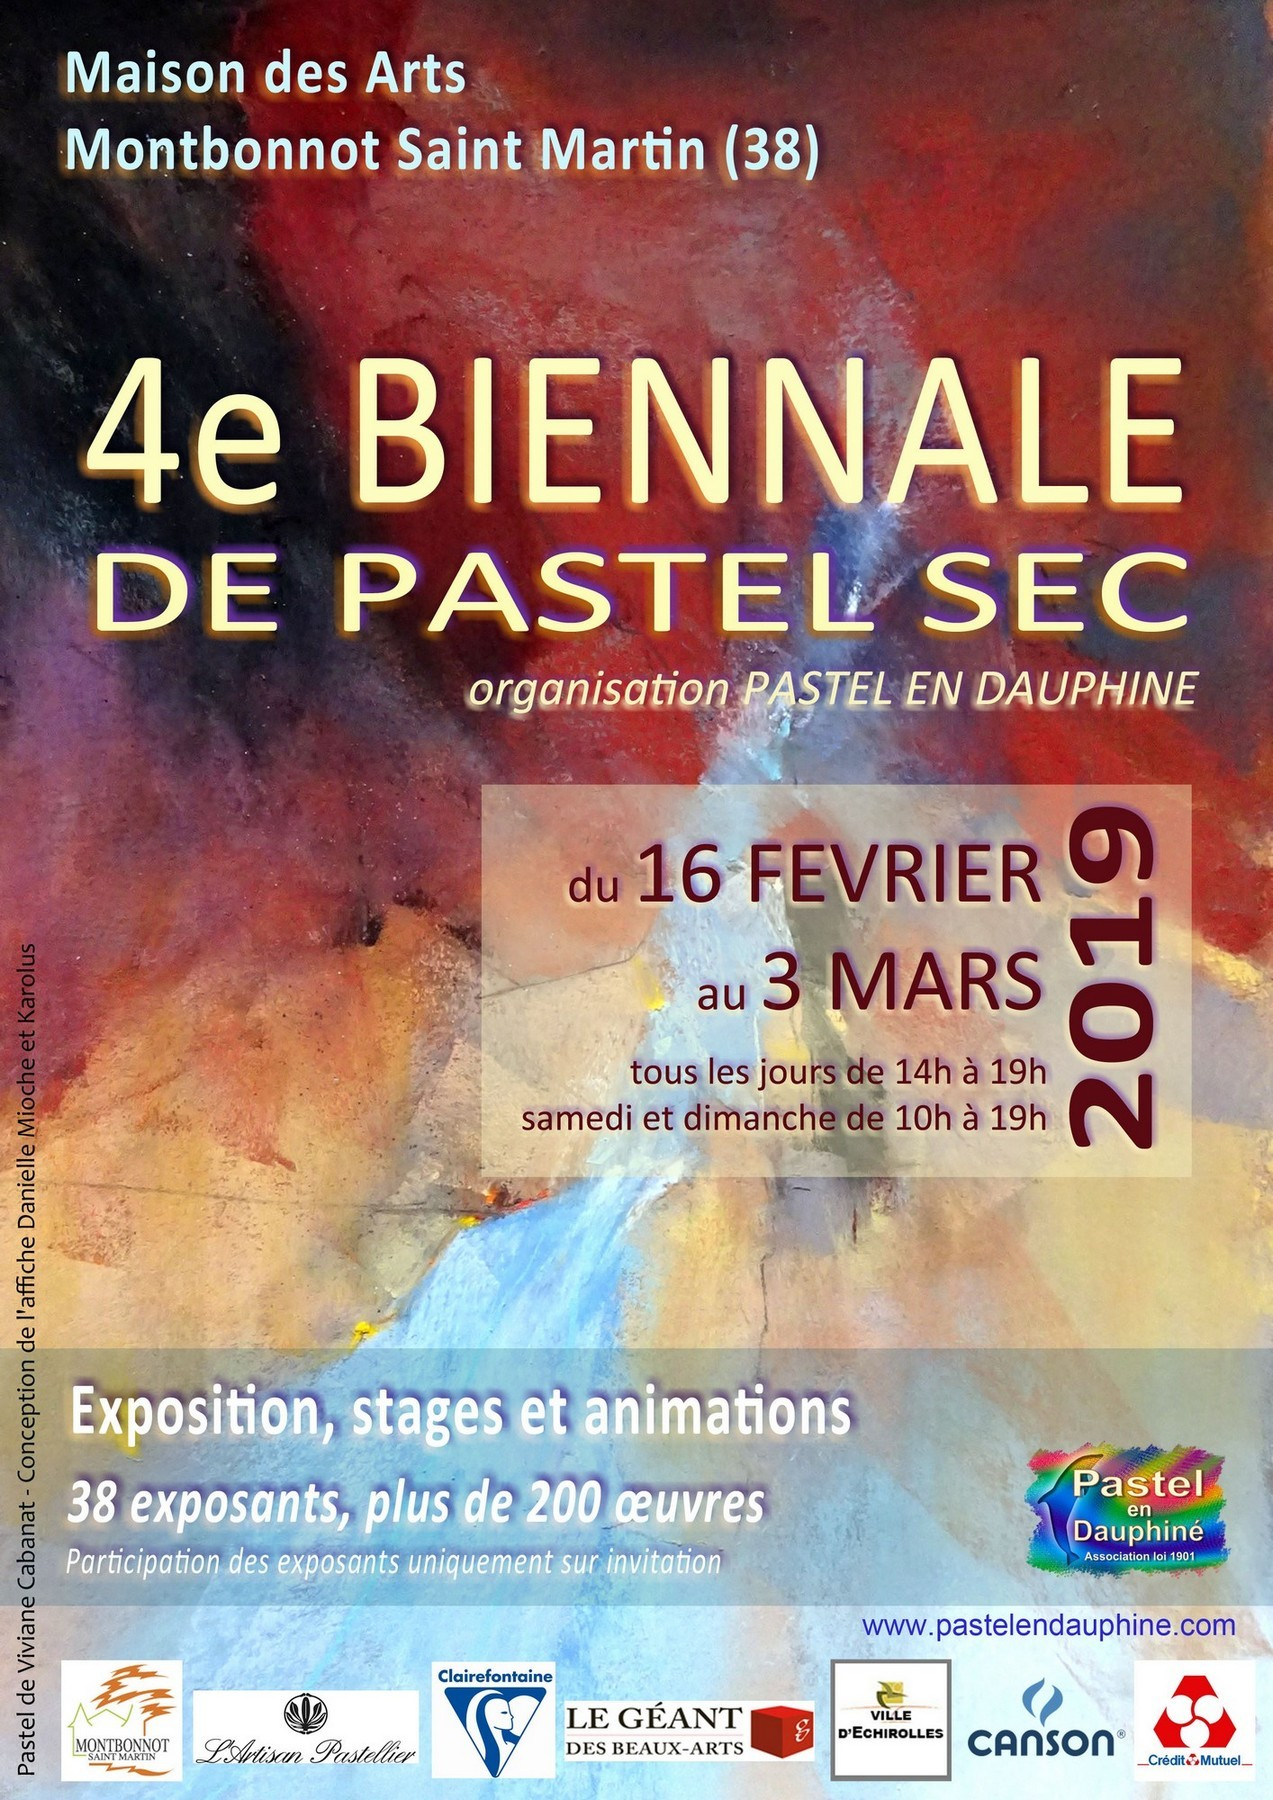 Claudette Allosio - biennale-def-2019-web-1.jpg